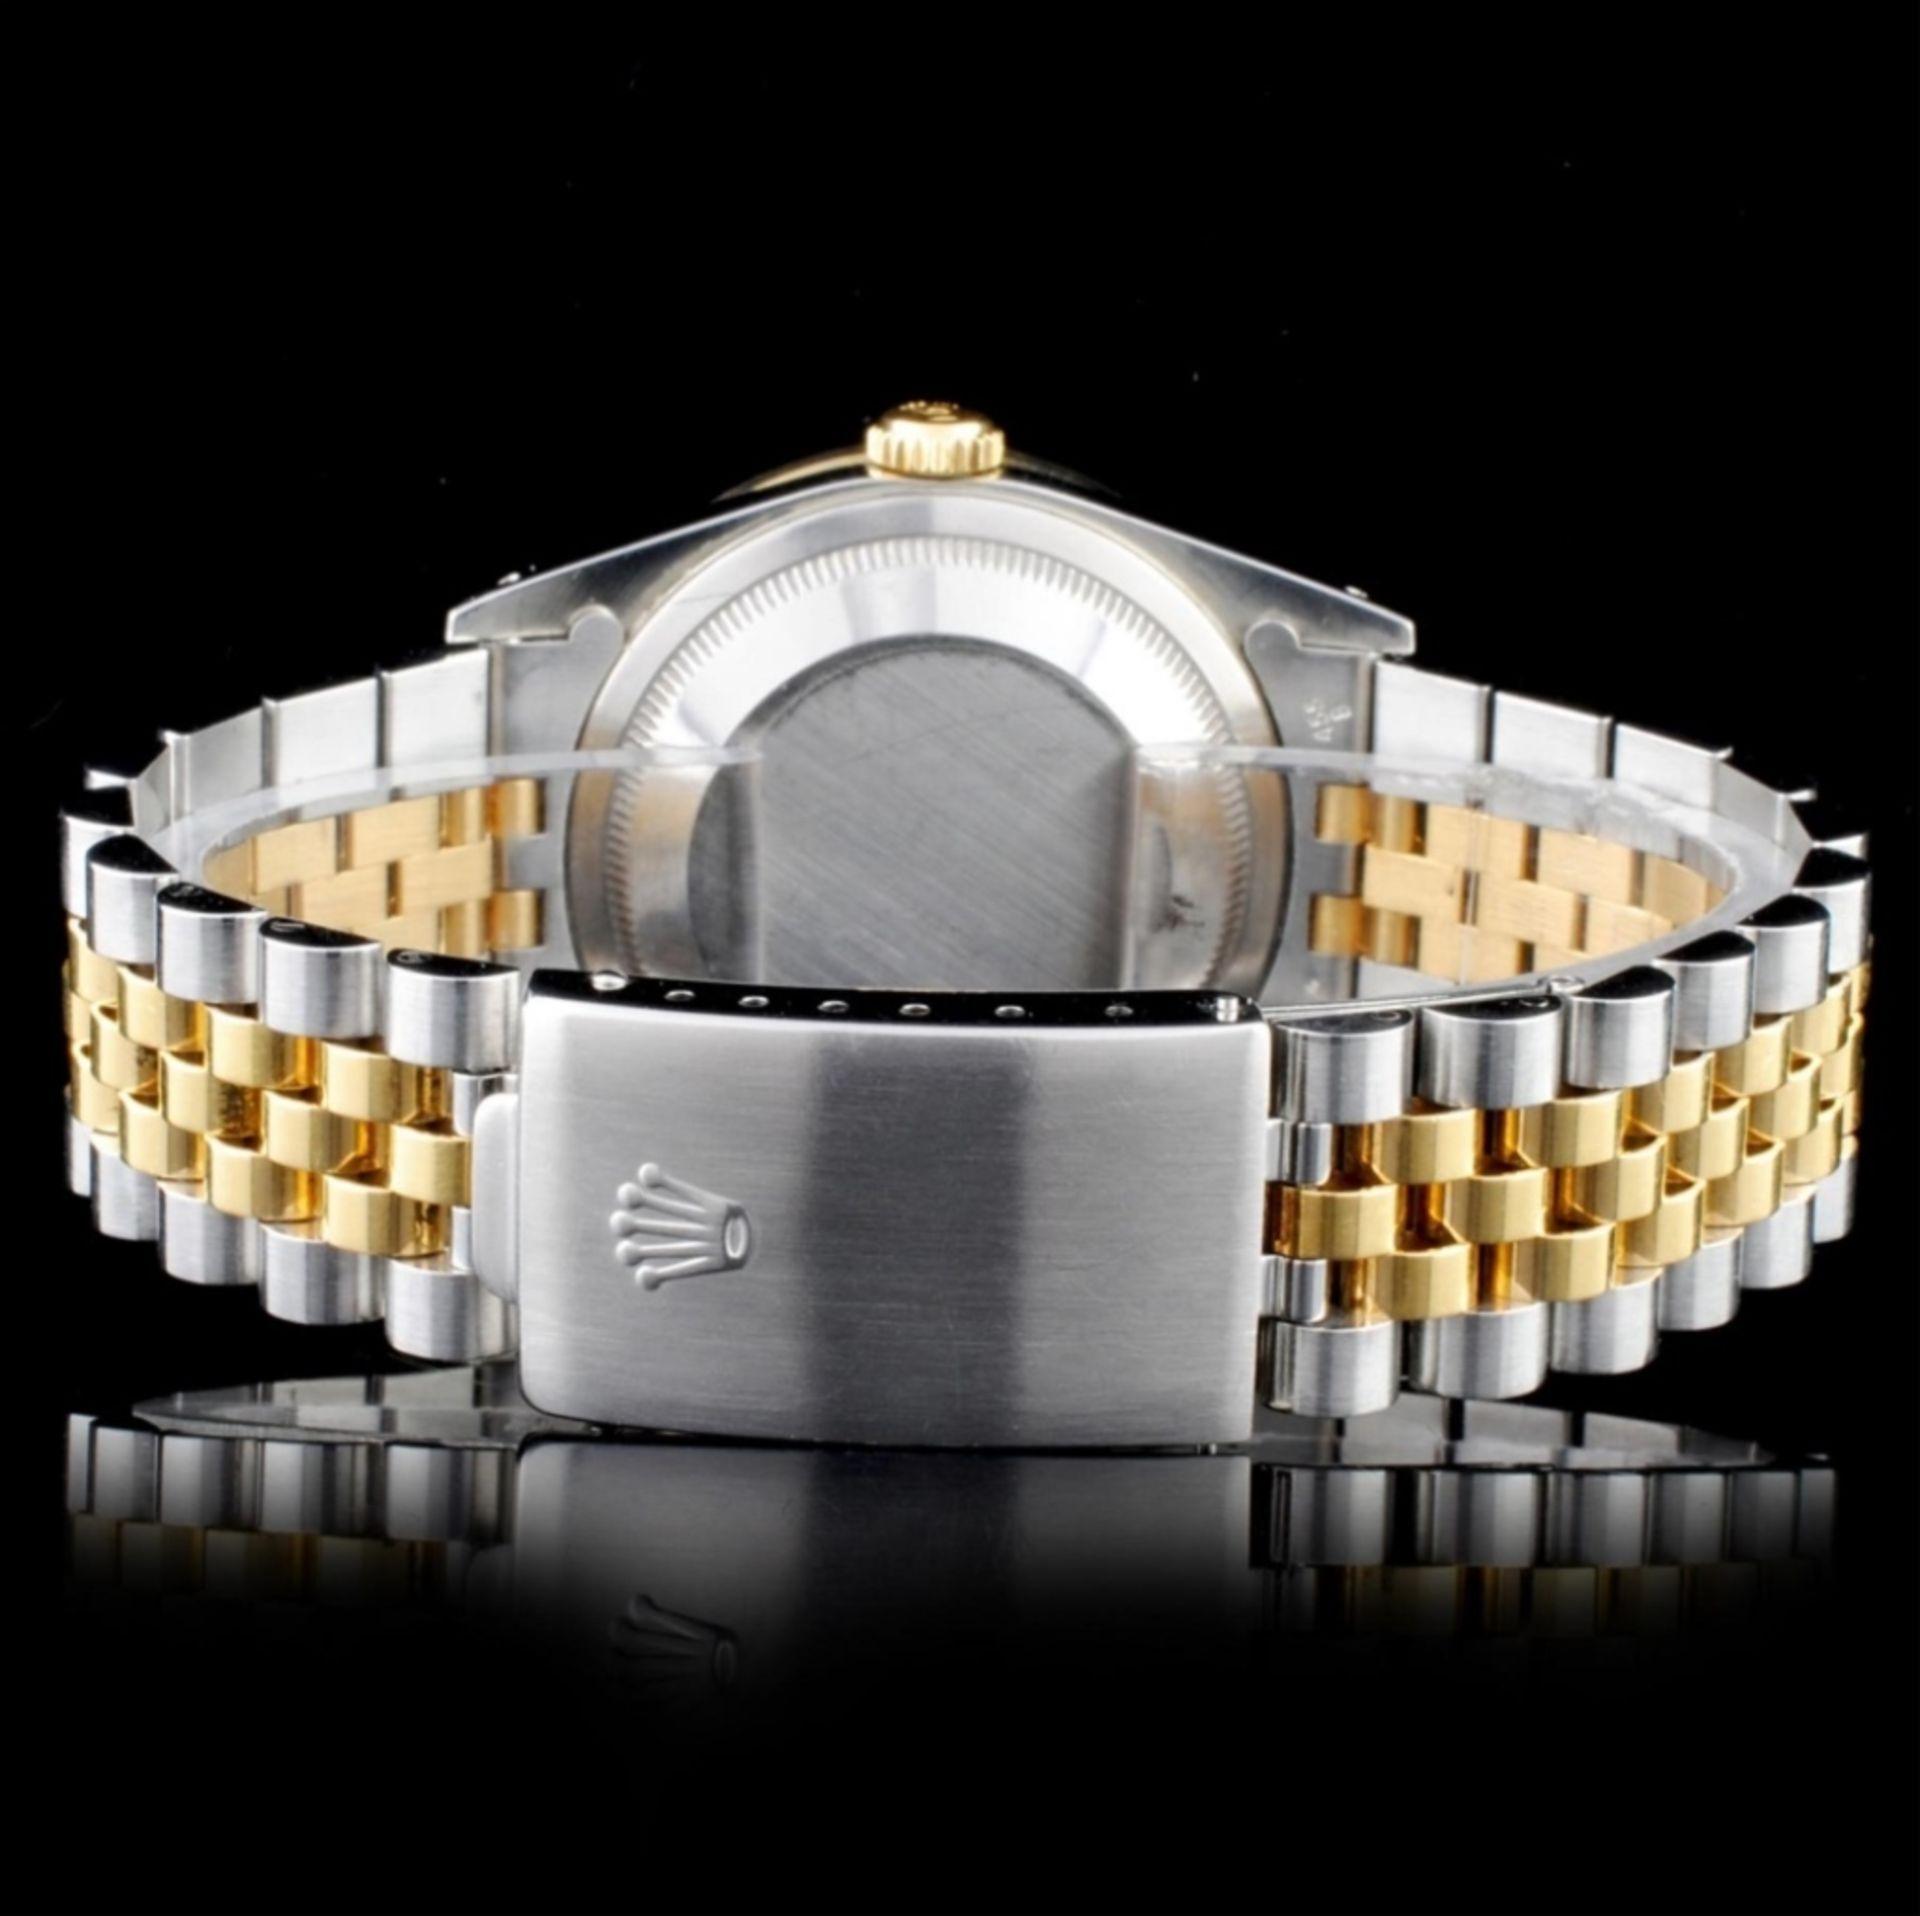 Rolex YG/SS DateJust 1.50ct Diamond 36MM Watch - Image 3 of 4